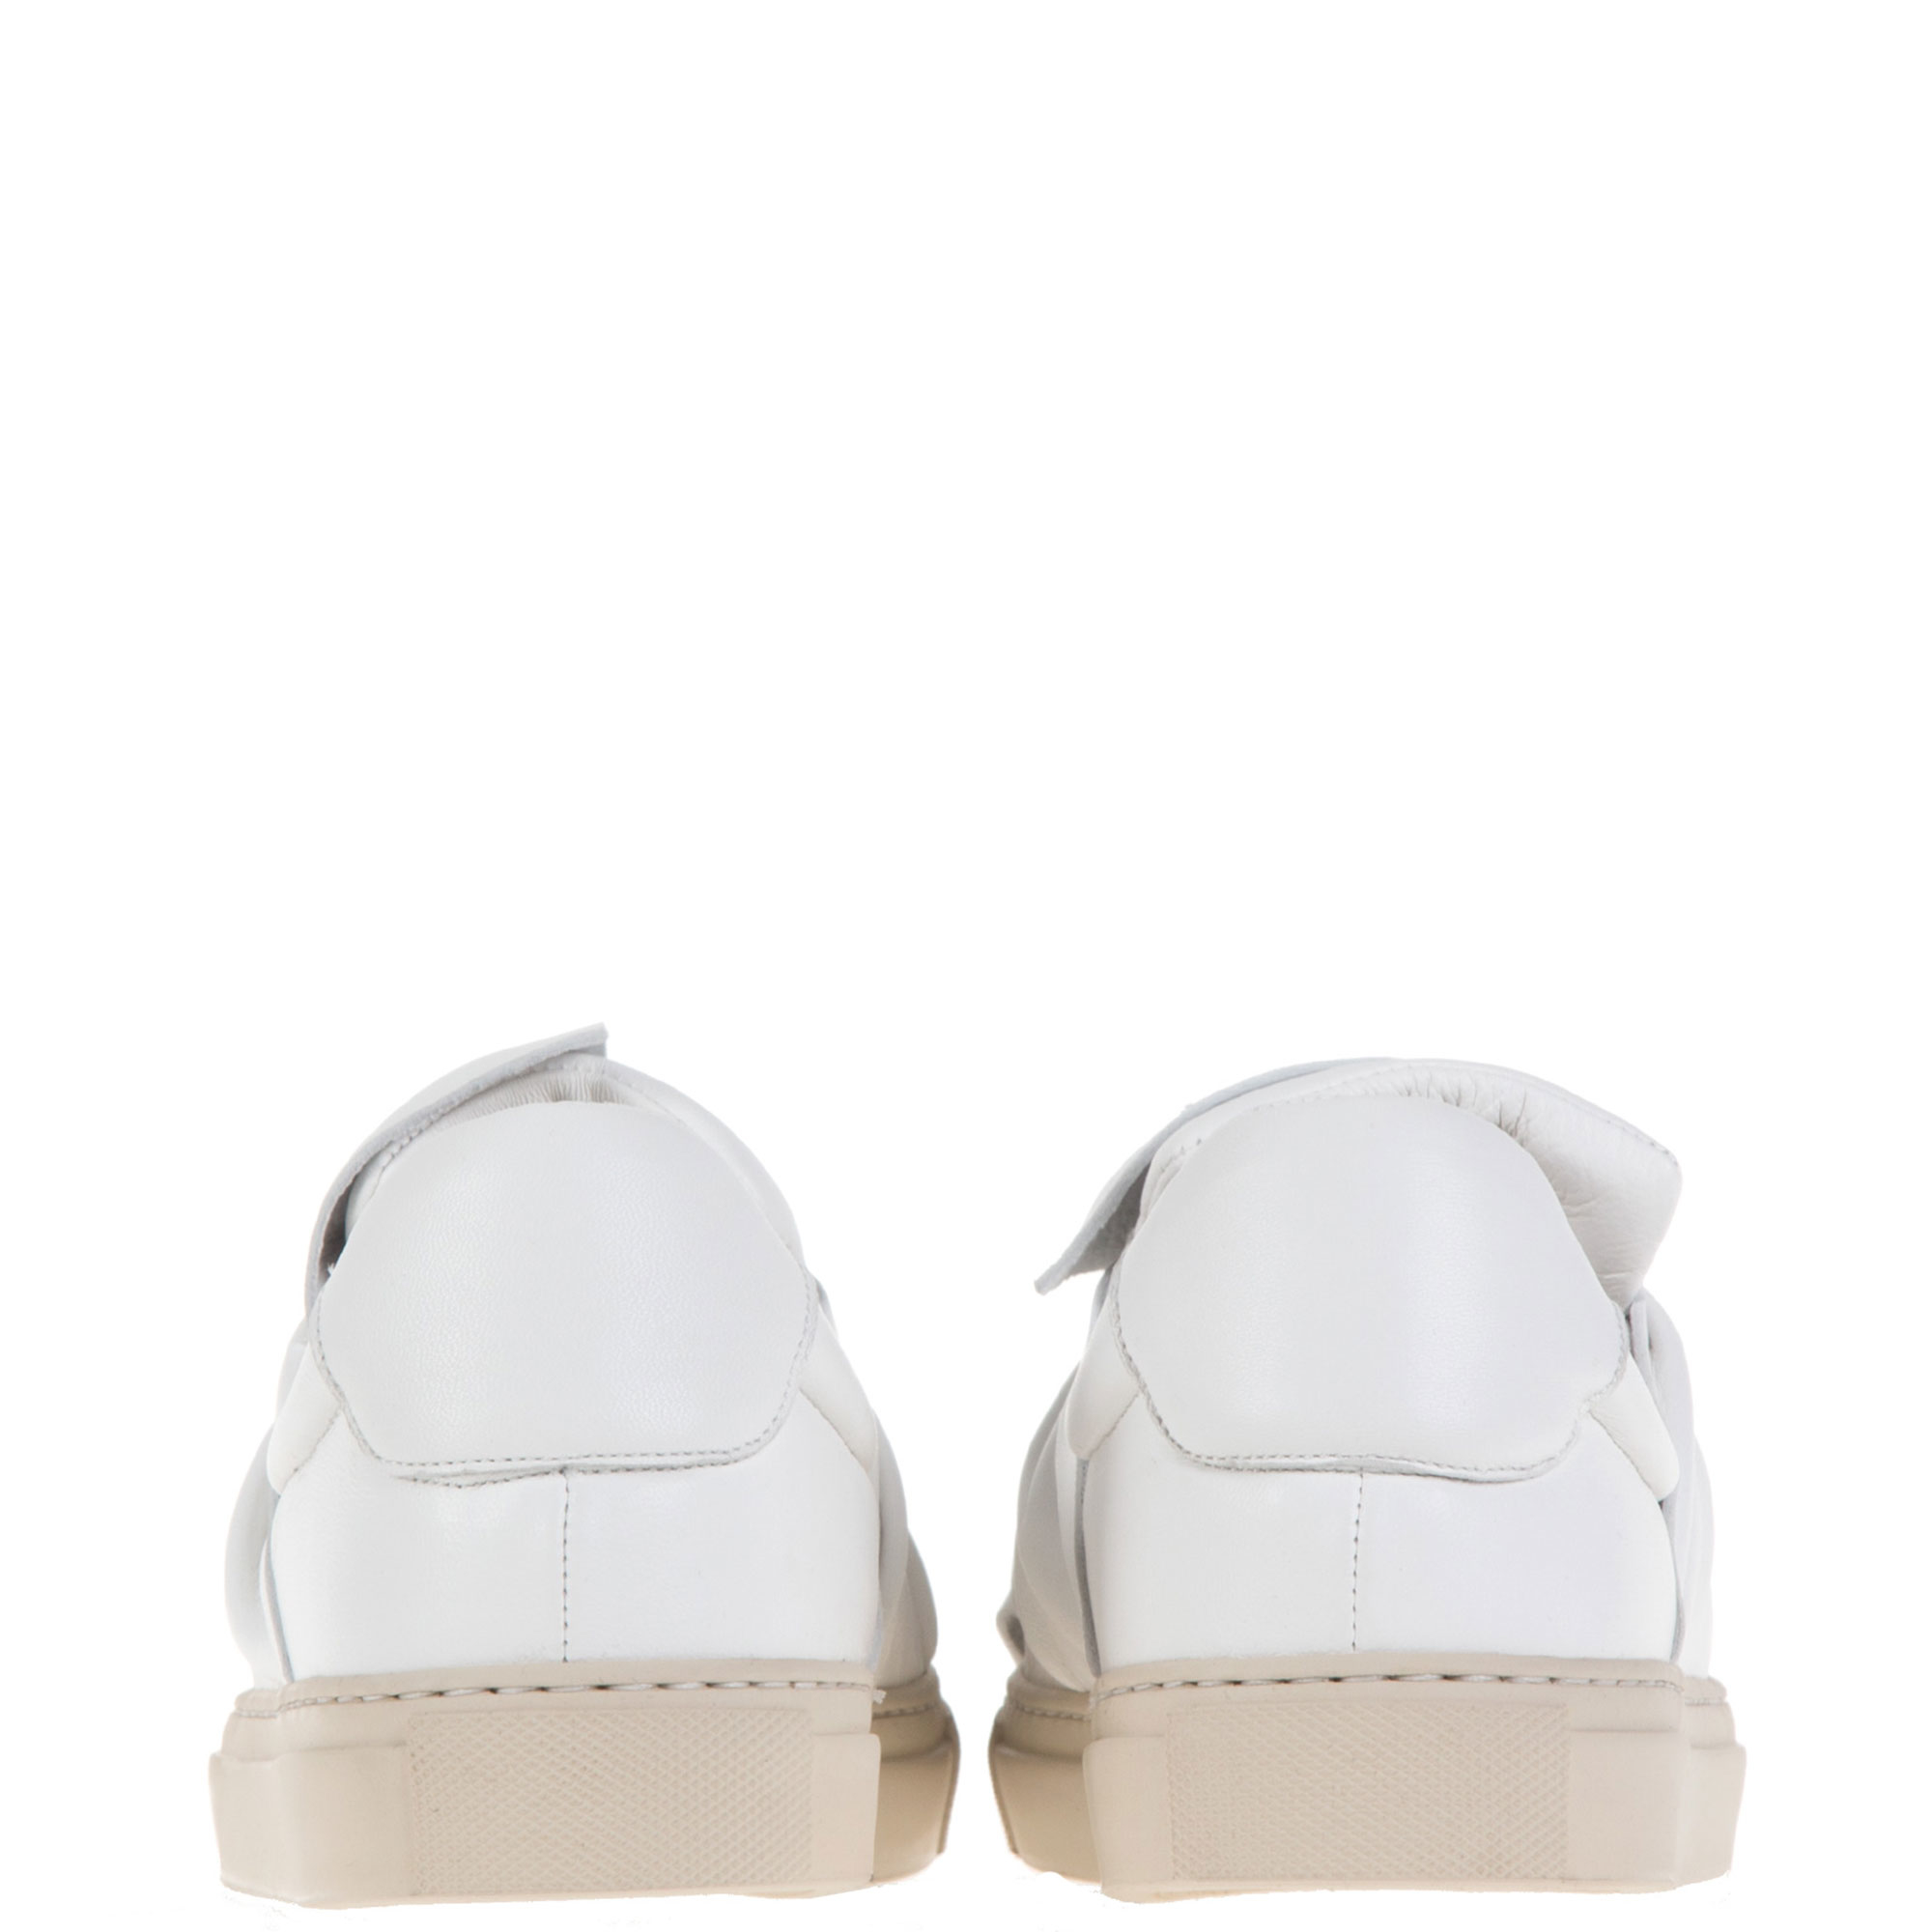 Ports 1961 Bee Lambskin Low-Top Sneakers in White